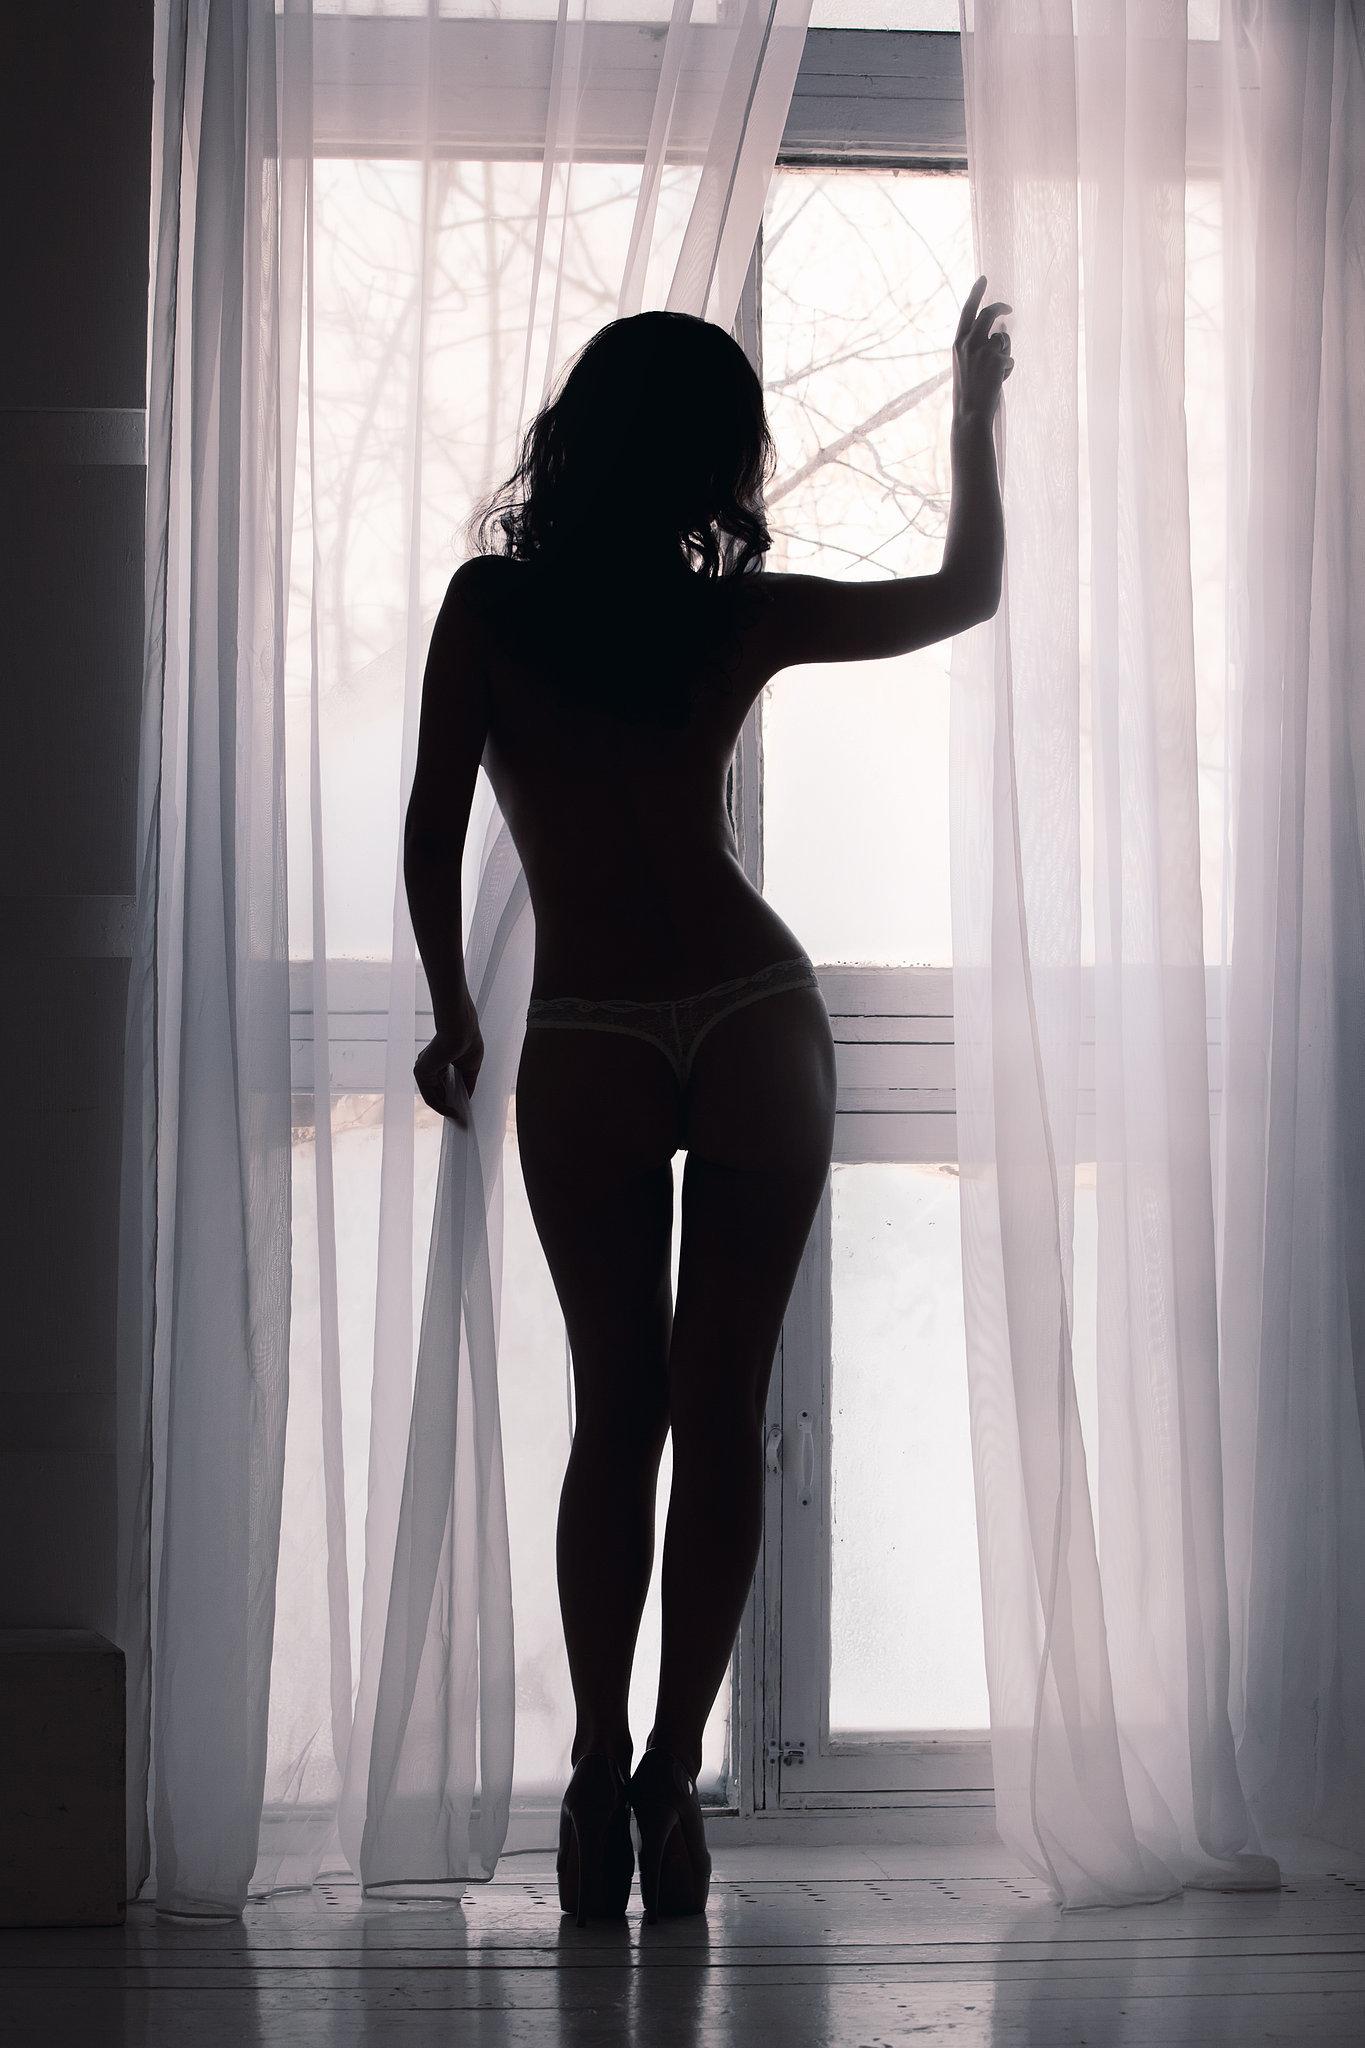 Фото раком у окна 6 фотография